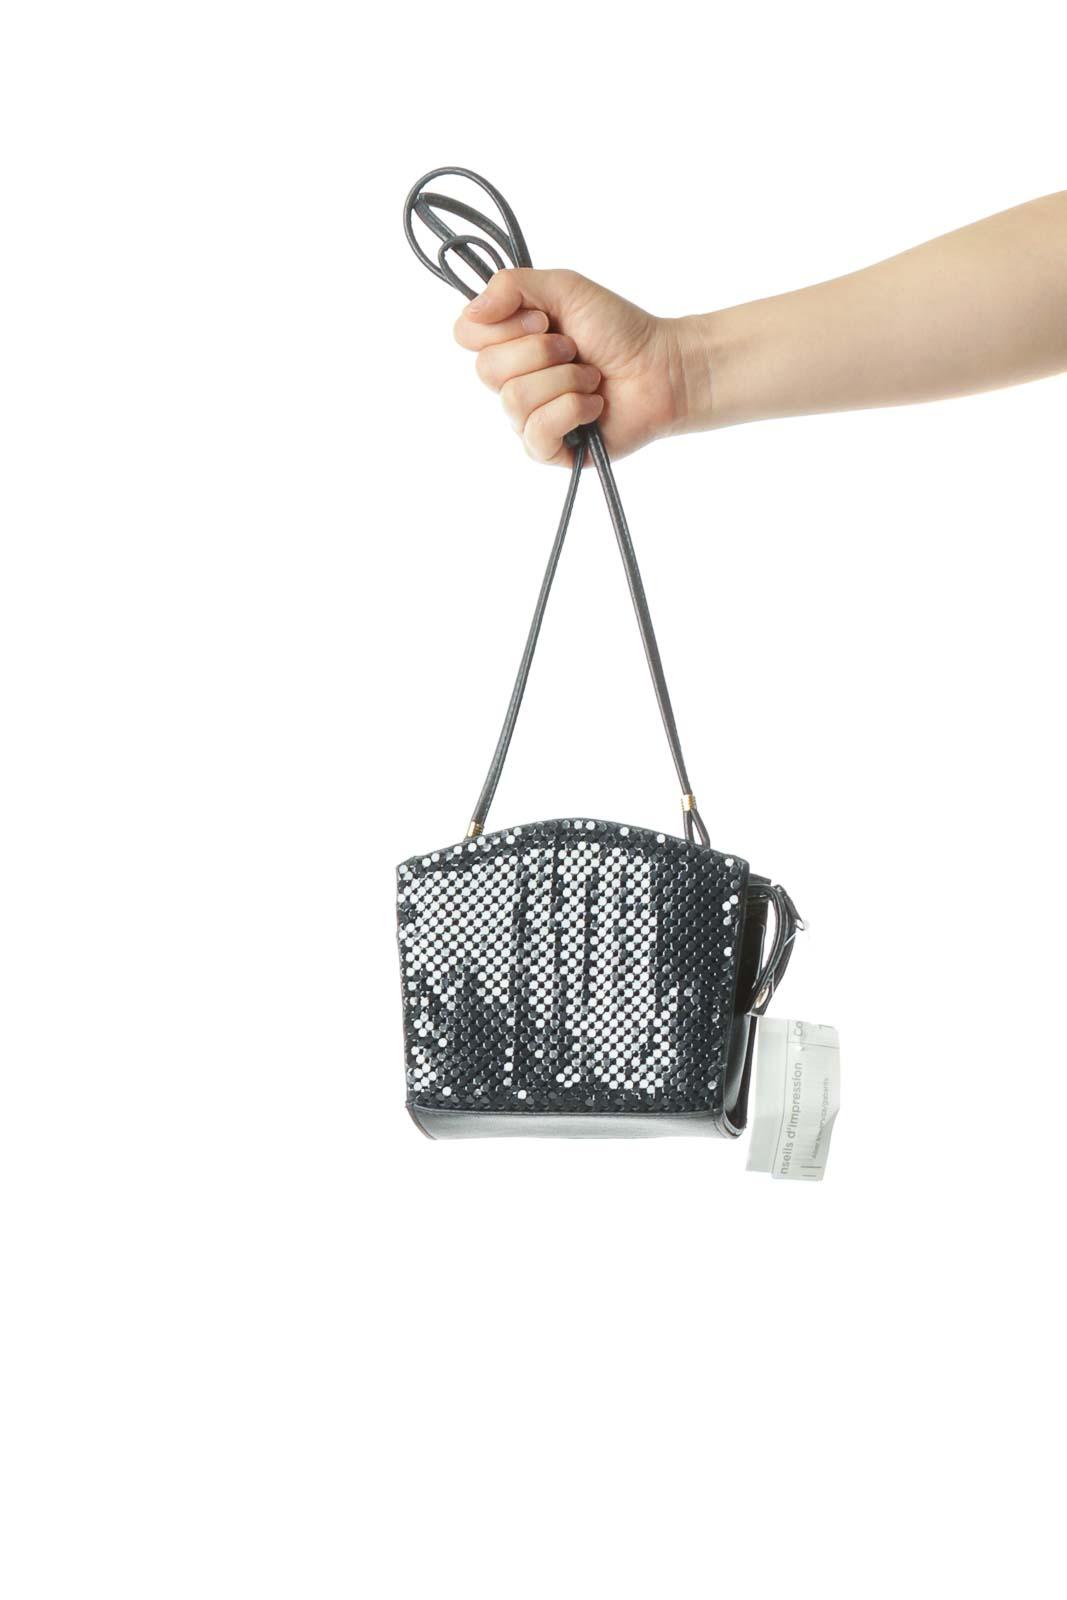 Blue Metallic Textured Net Possible Hidden Strap Shoulder Bag Front